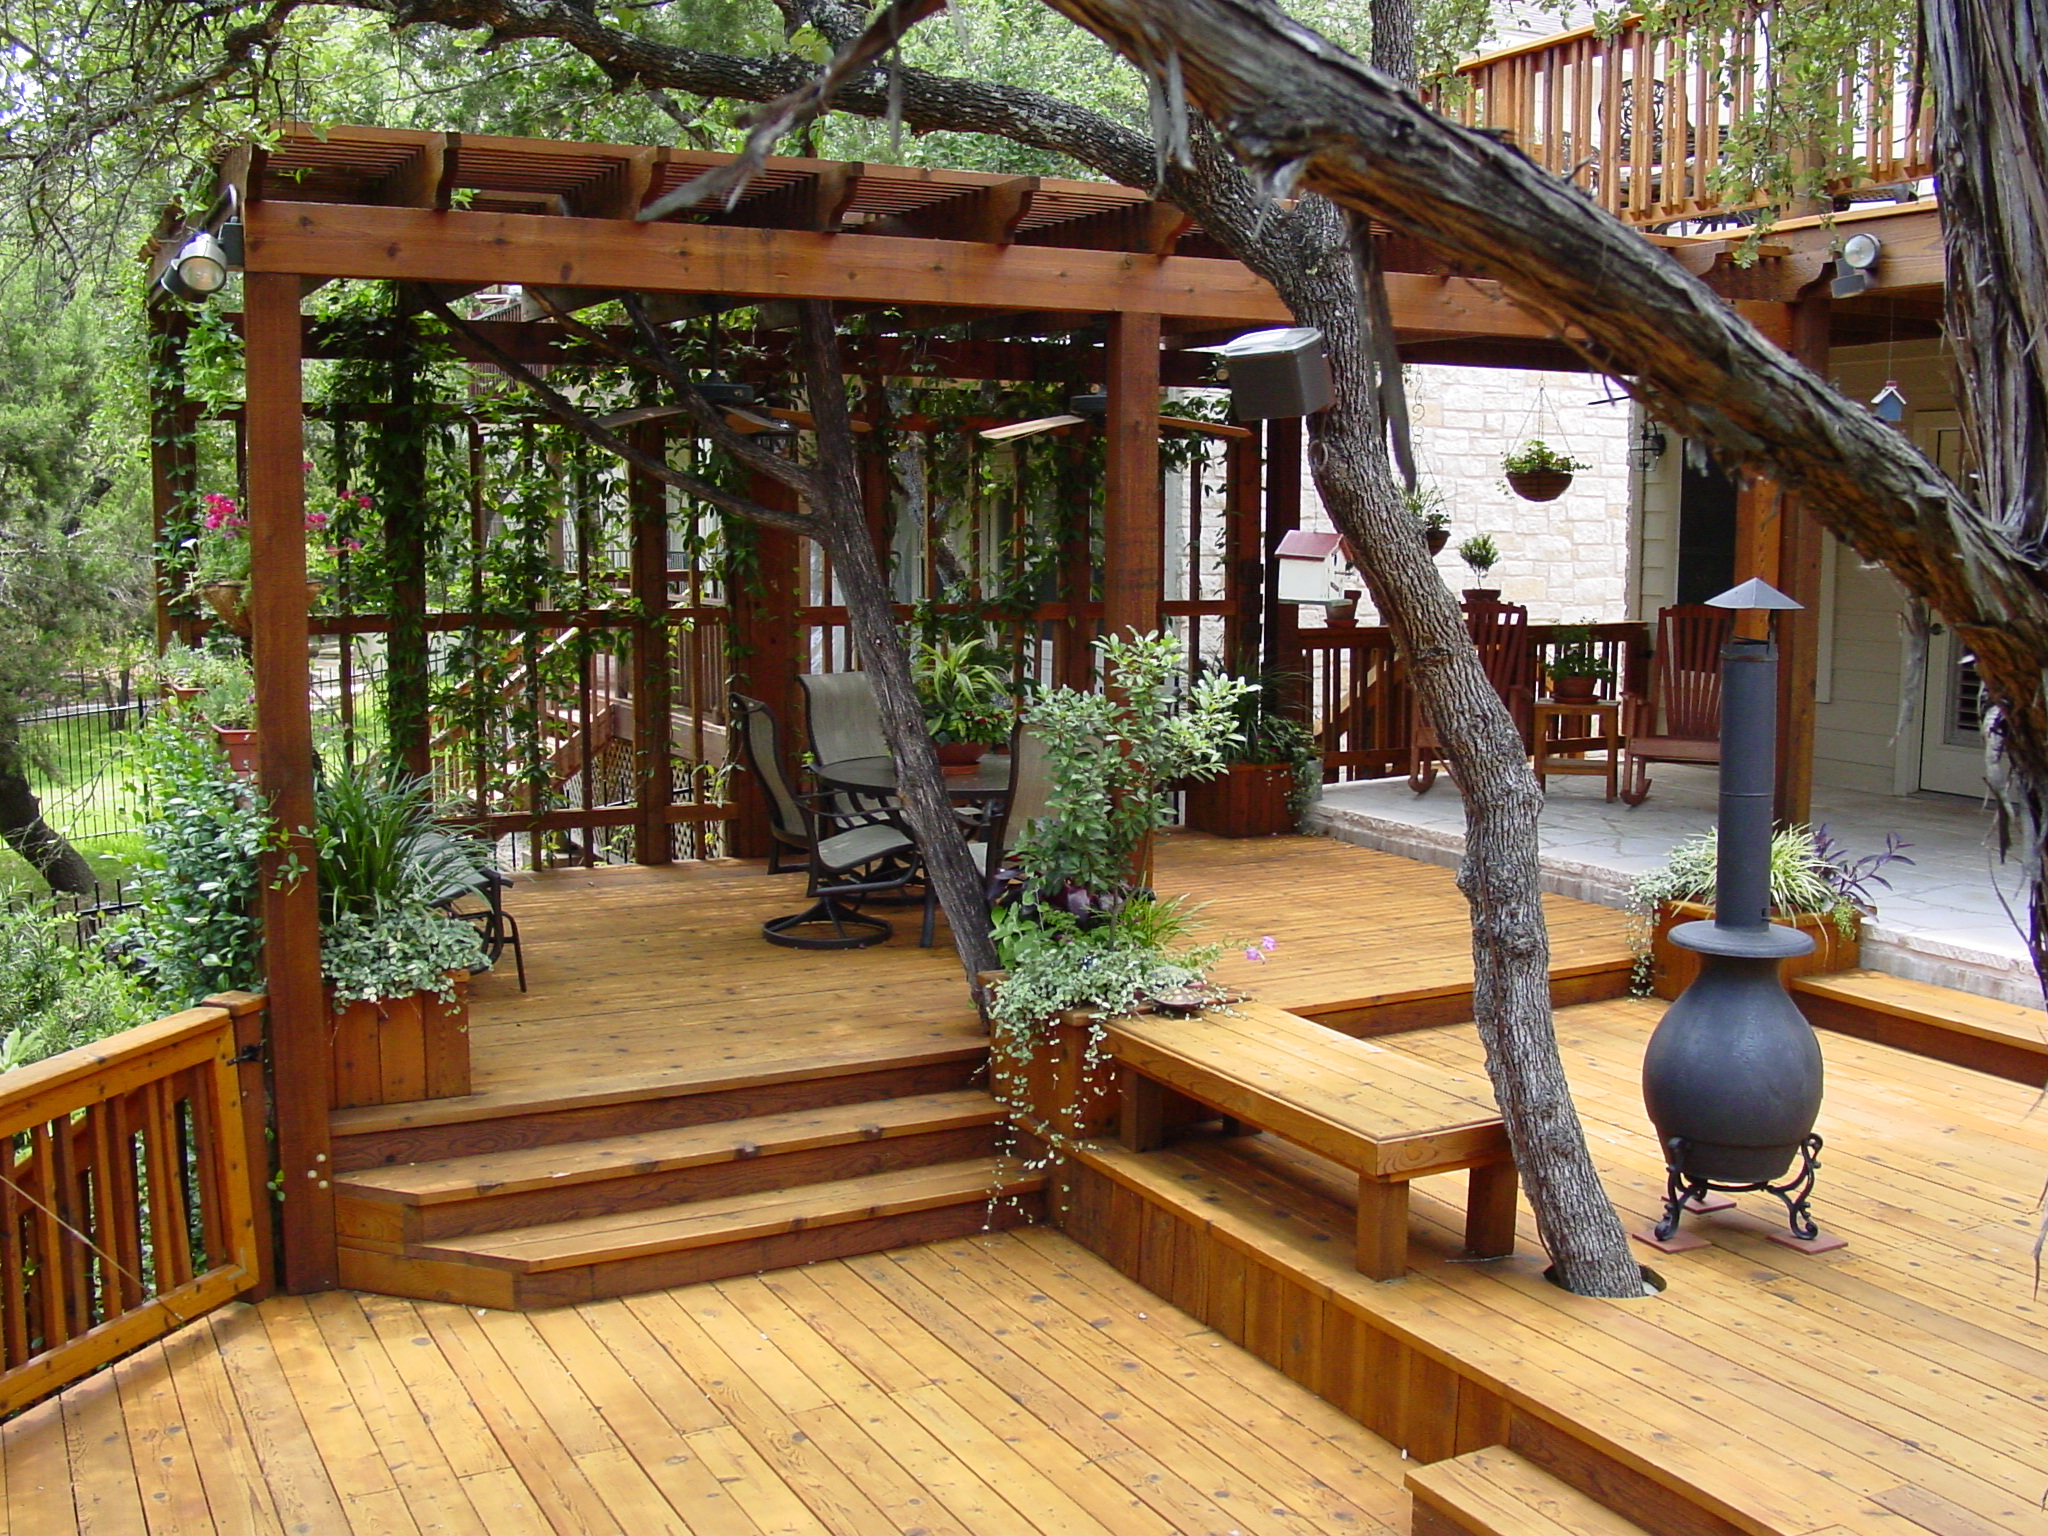 Outdoor structure event planning Austin TX | Austin Decks ... on Backyard Porch Ideas Covered Decks Diy id=71655